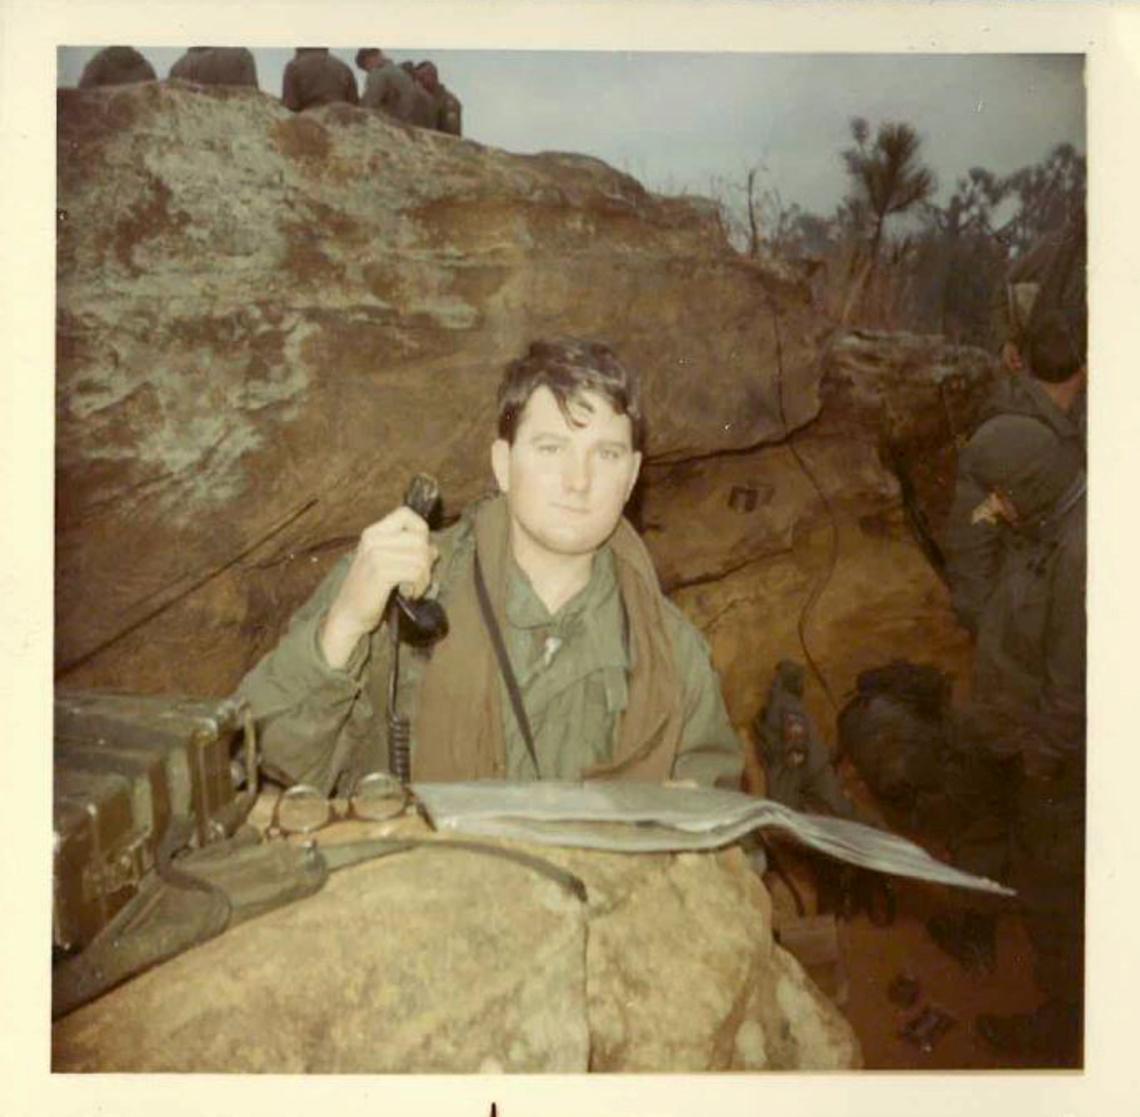 Andrew Brannan in Vietnam circa 1969.